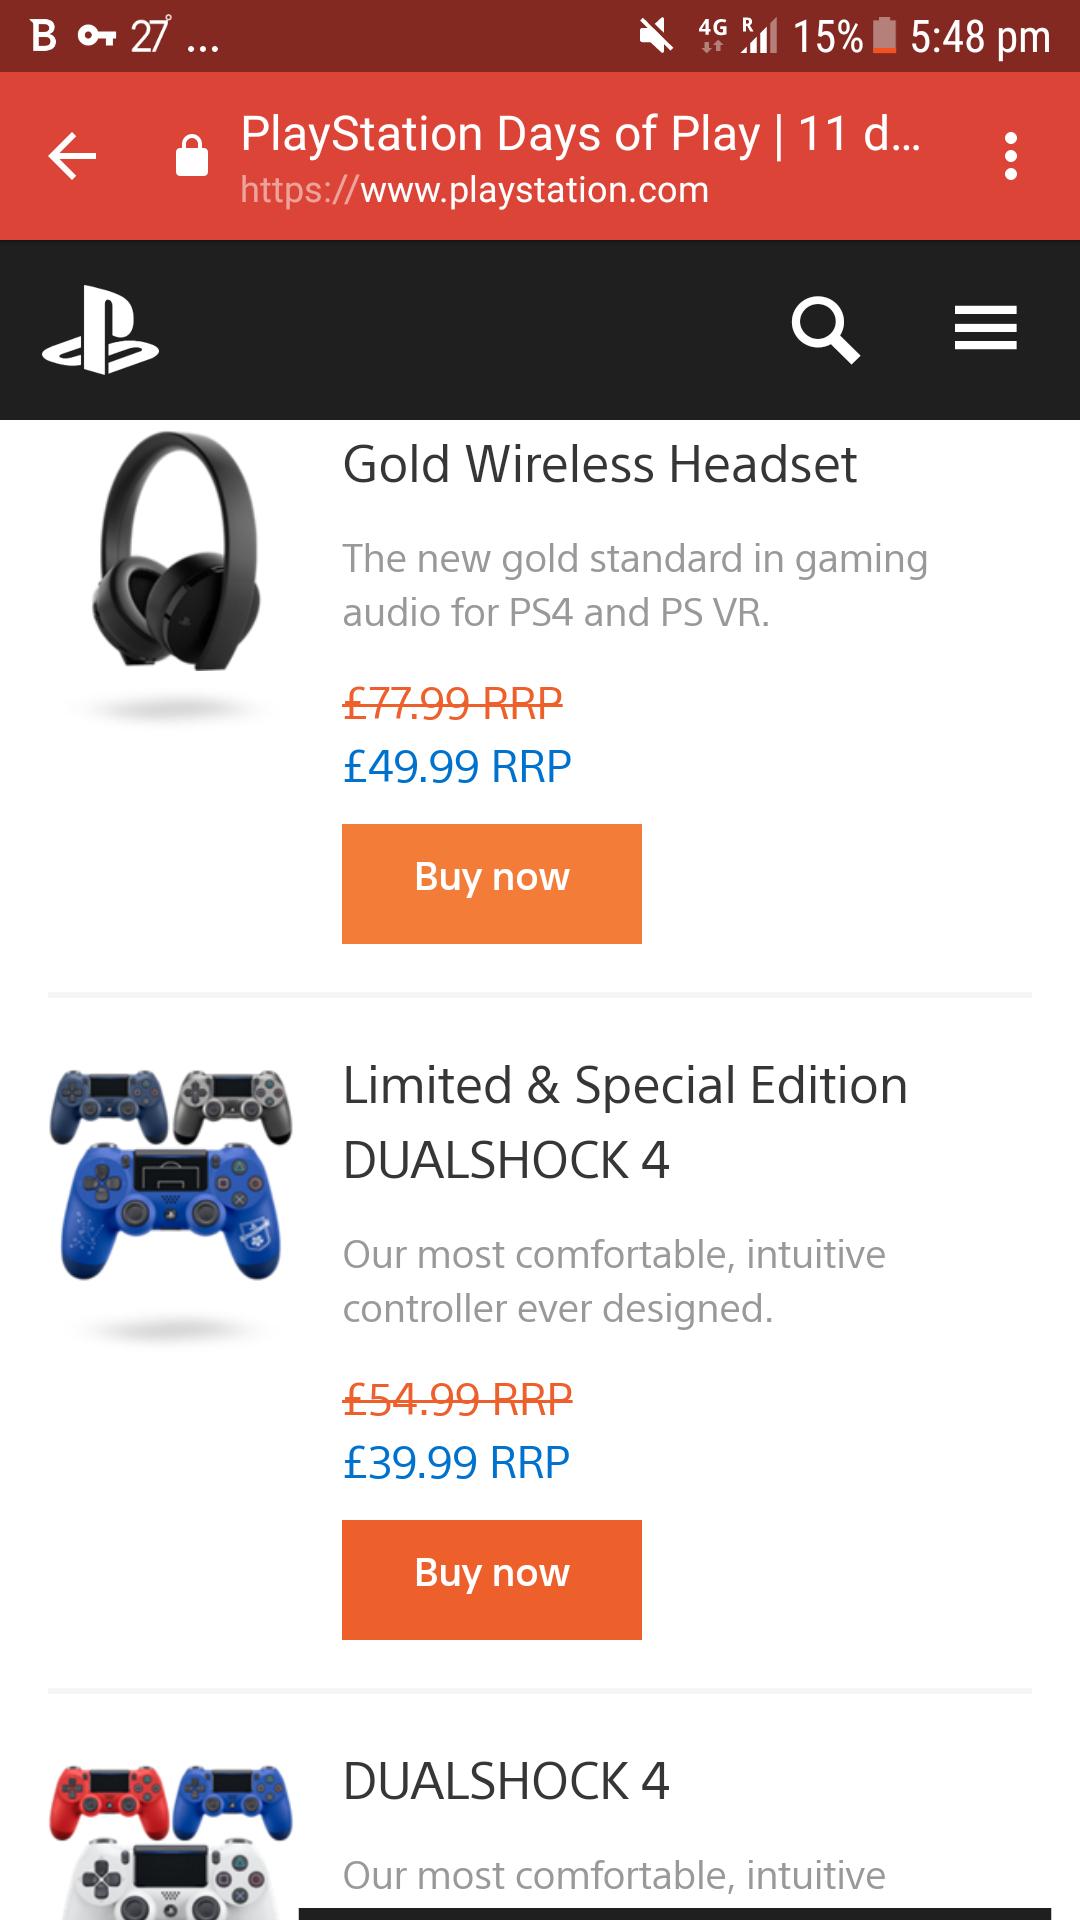 Sony Gold 7.1 wireless Headset new version v2 - £49.99 @ Smyths, pc world, very, shopto, game and amazon